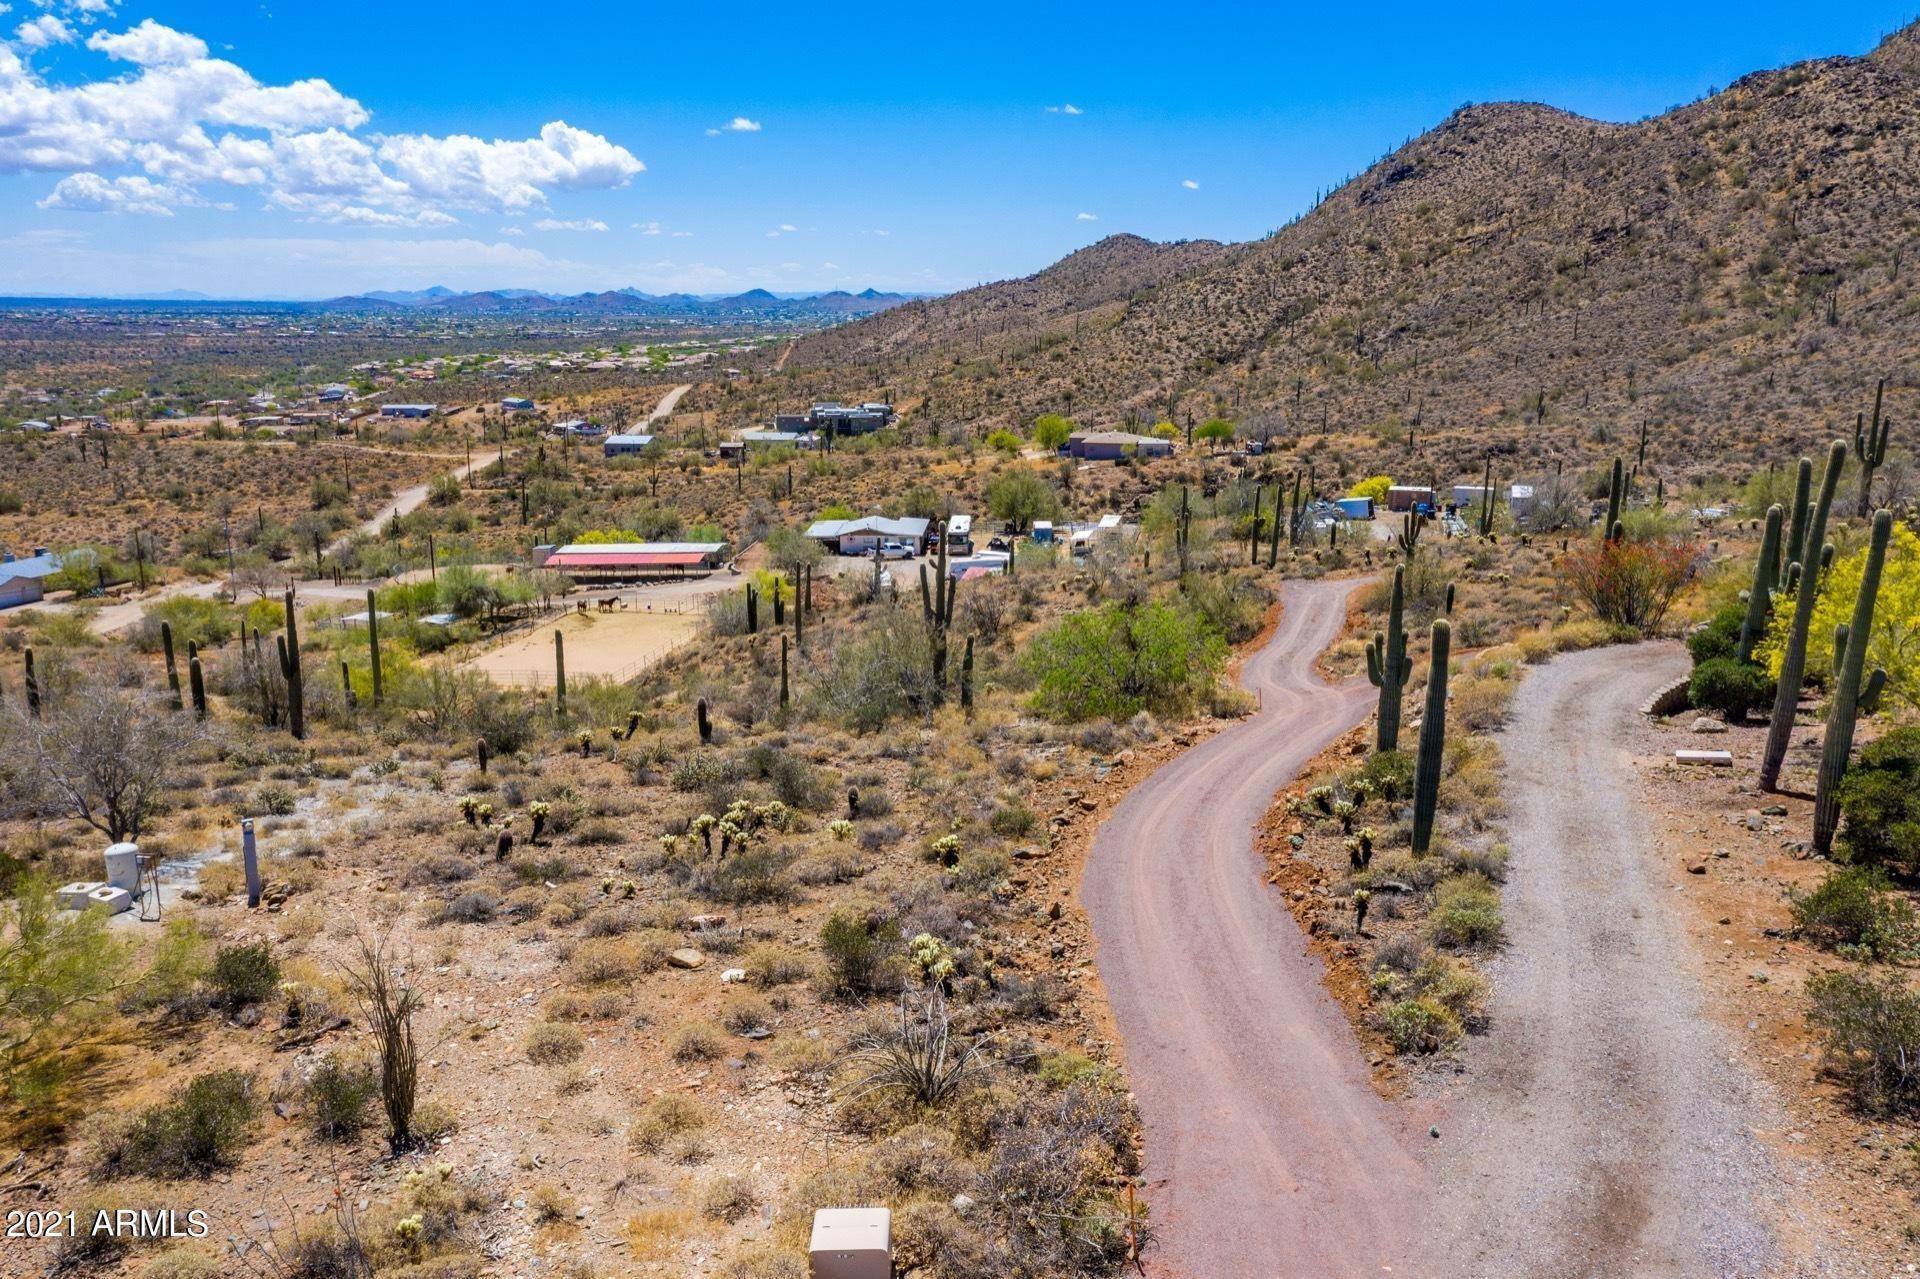 Photo of 439xx N 13 Avenue, New River, AZ 85087 (MLS # 6228311)